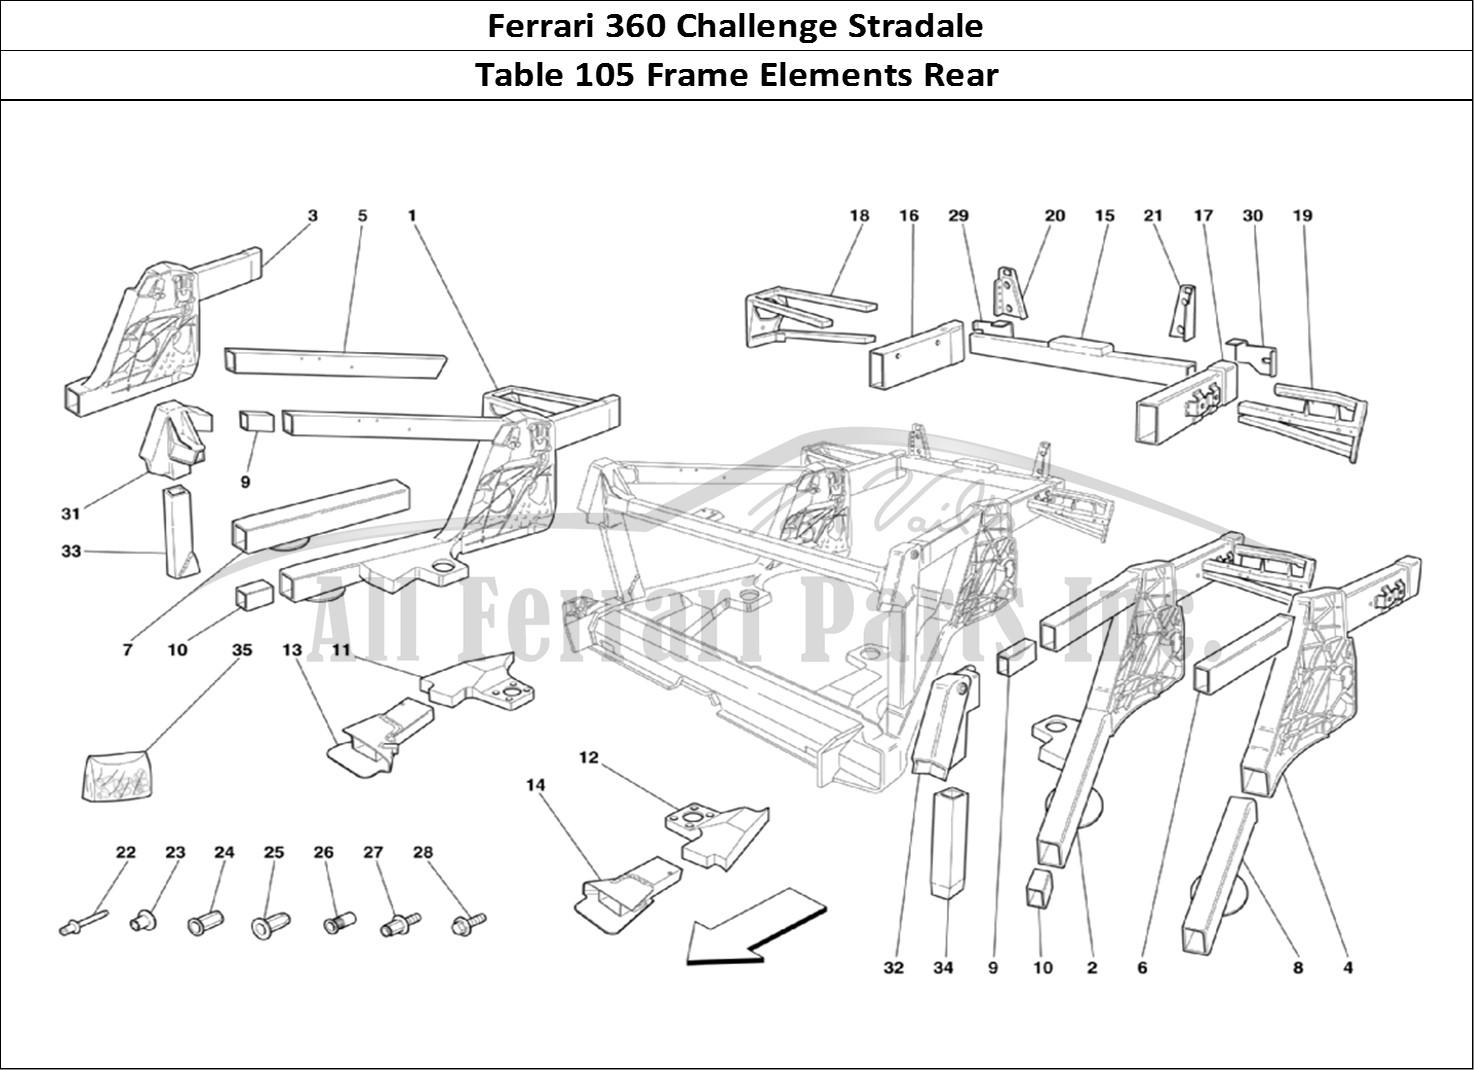 Buy original Ferrari 360 Challenge Stradale 105 Frame